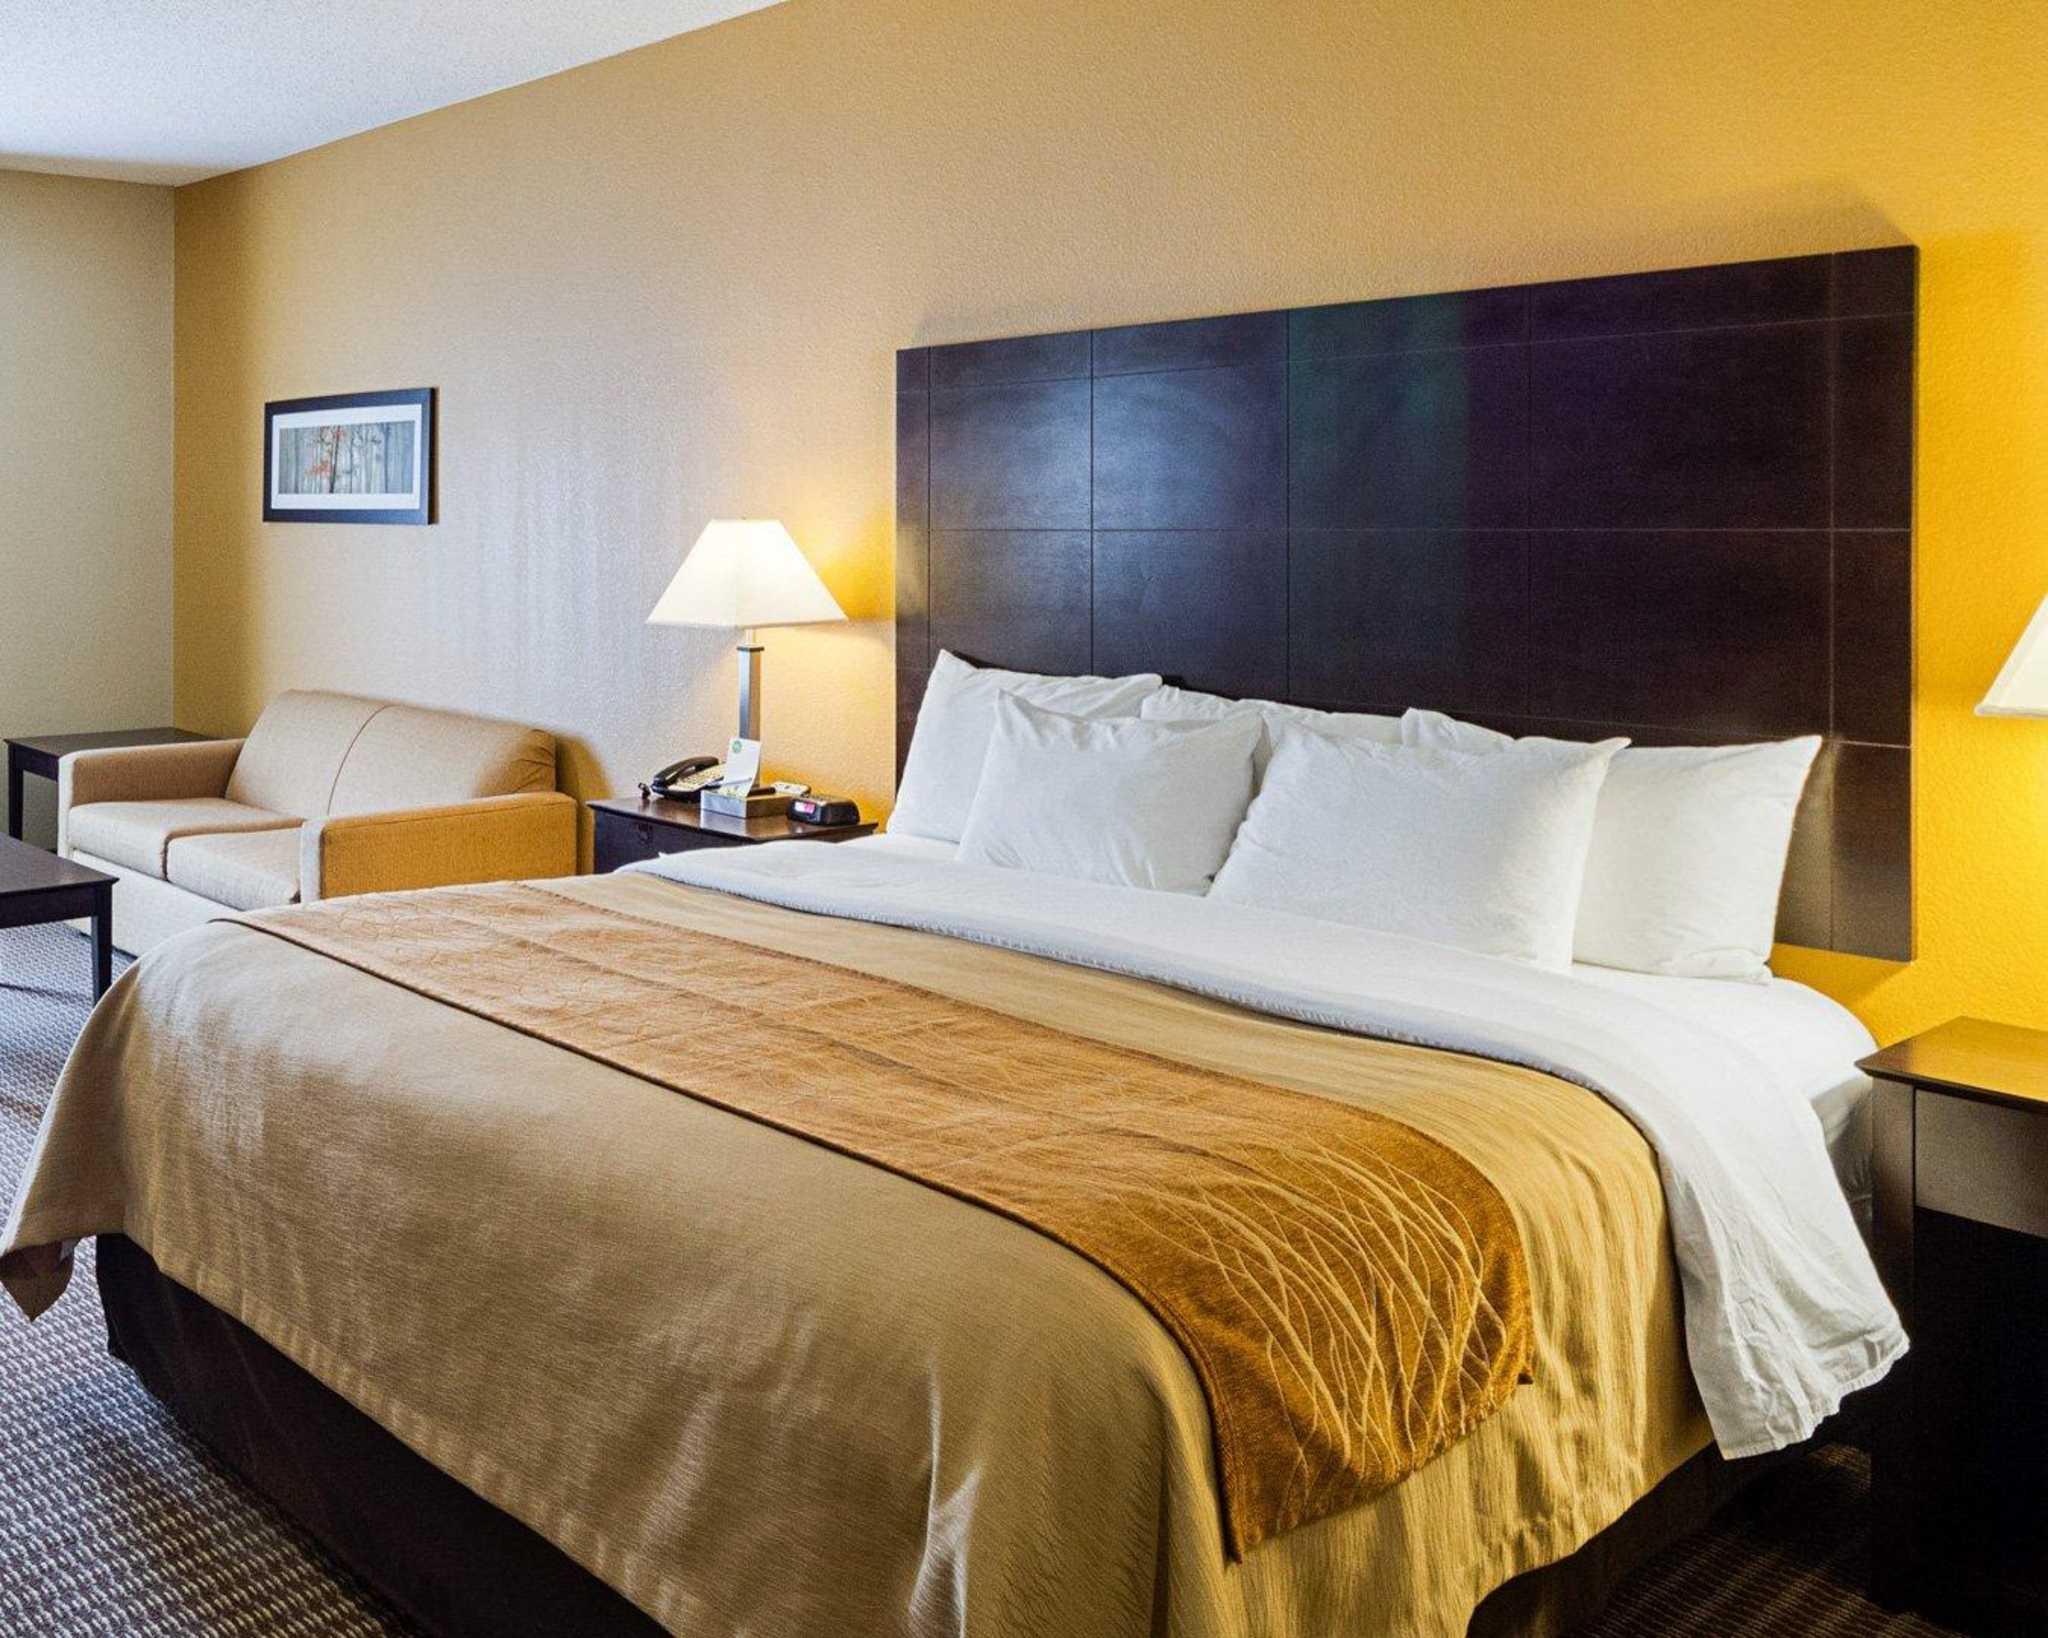 Comfort Inn & Suites image 9